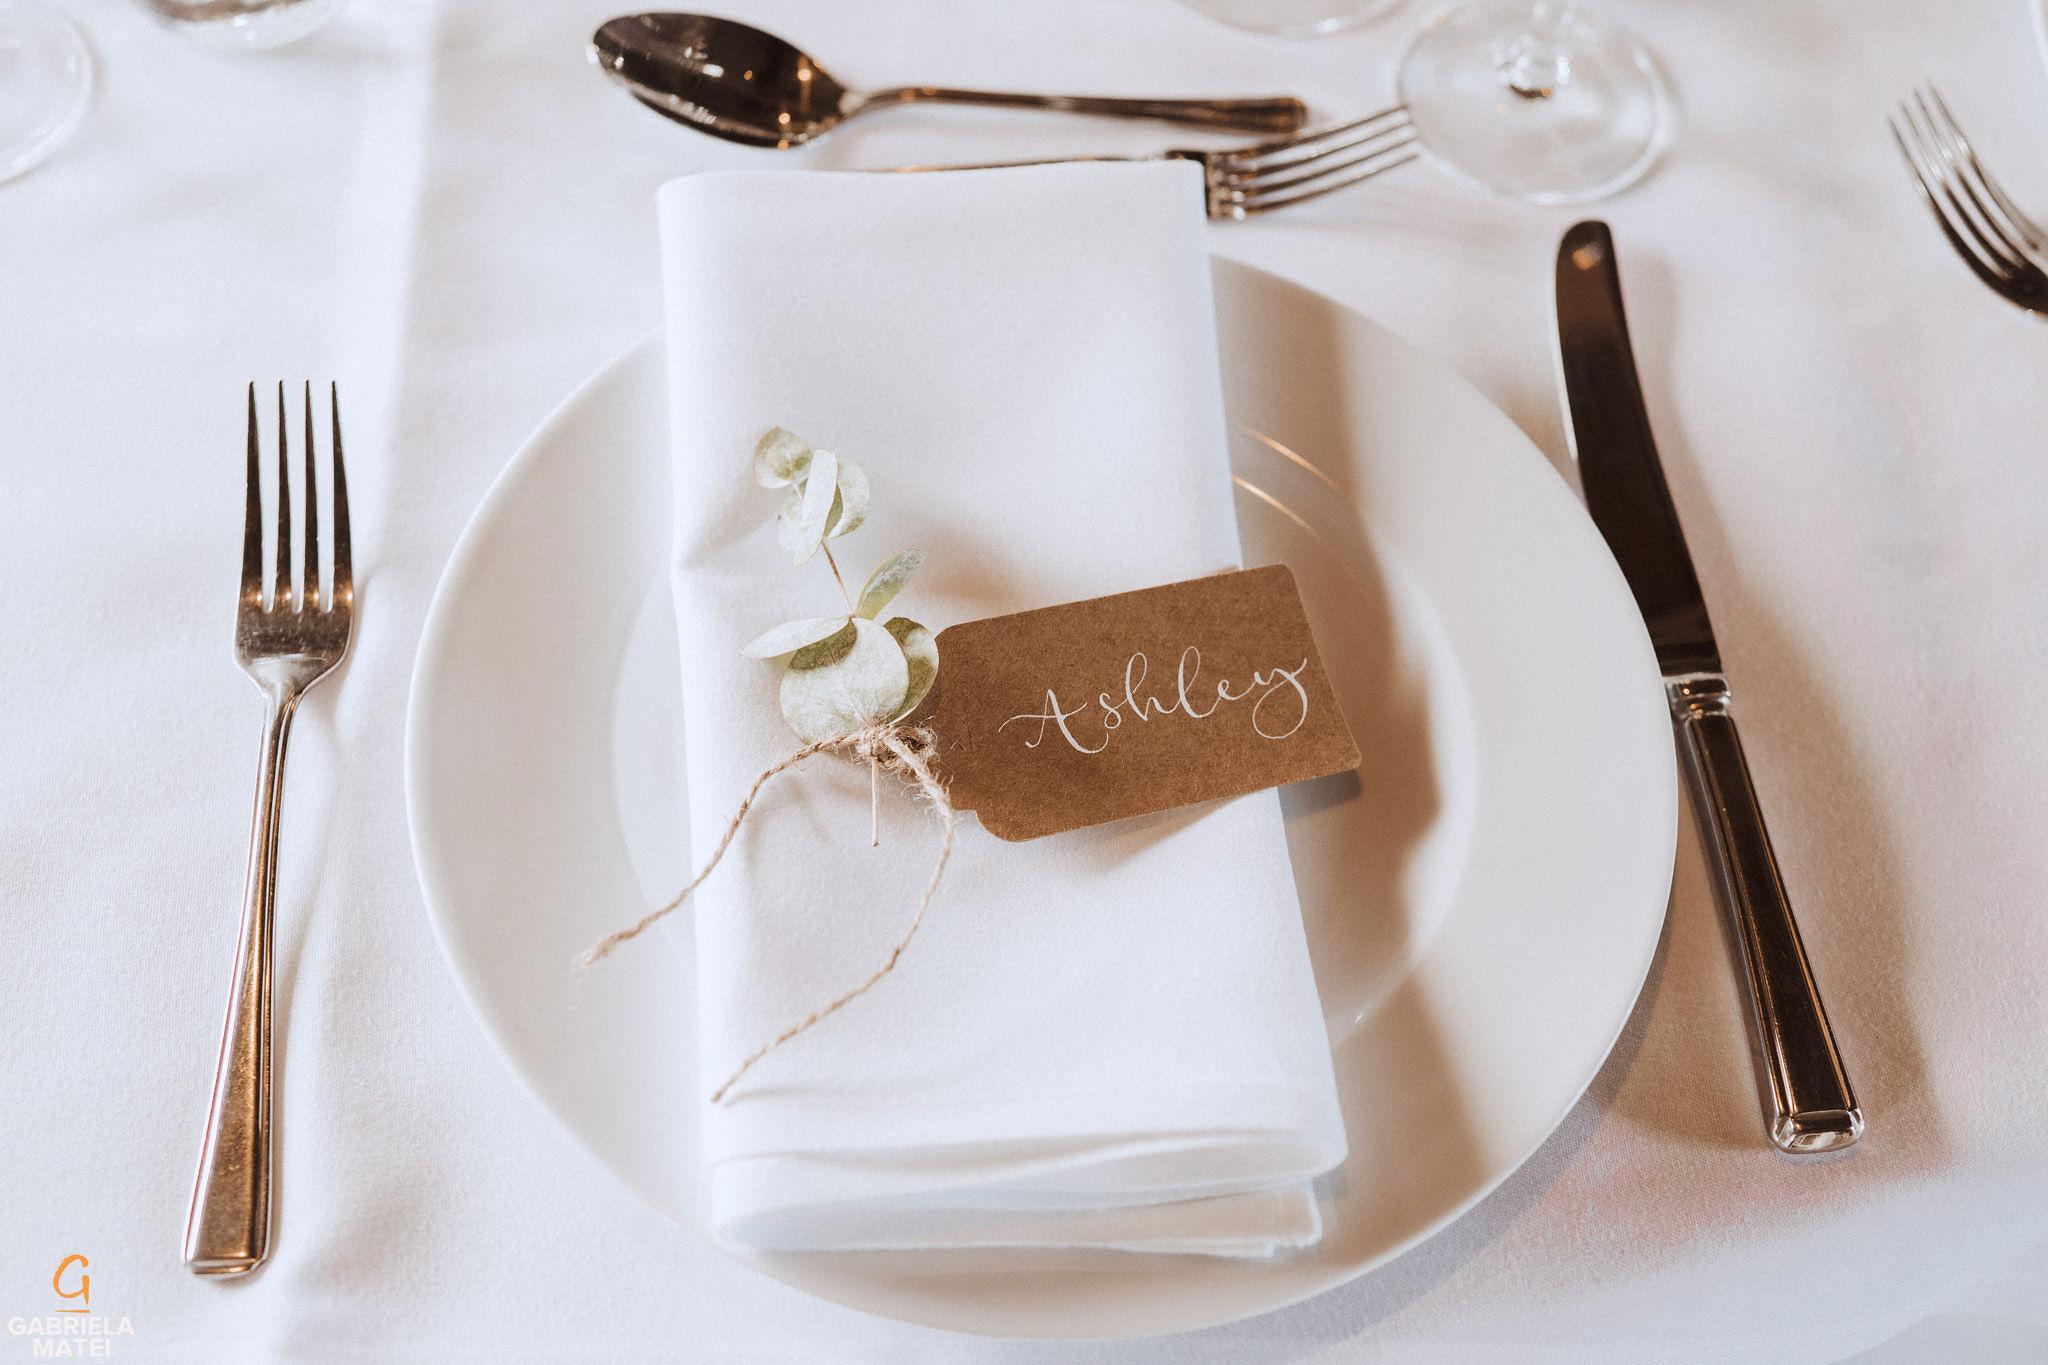 wedding details at South Stoke Barn wedding venue in Arundel